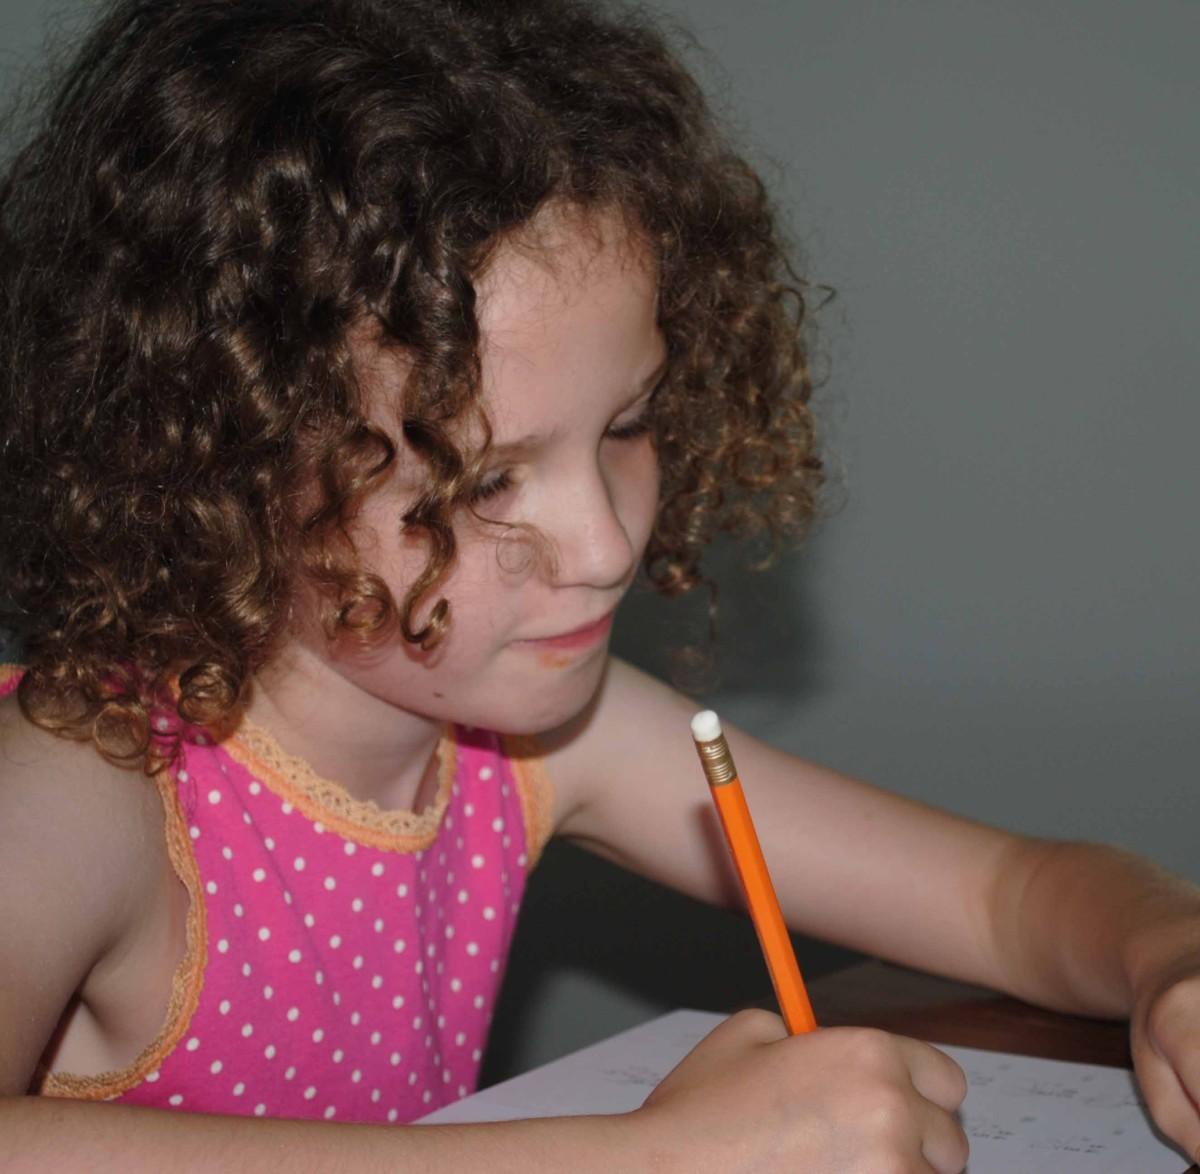 Child doing Kumon Math Worksheets